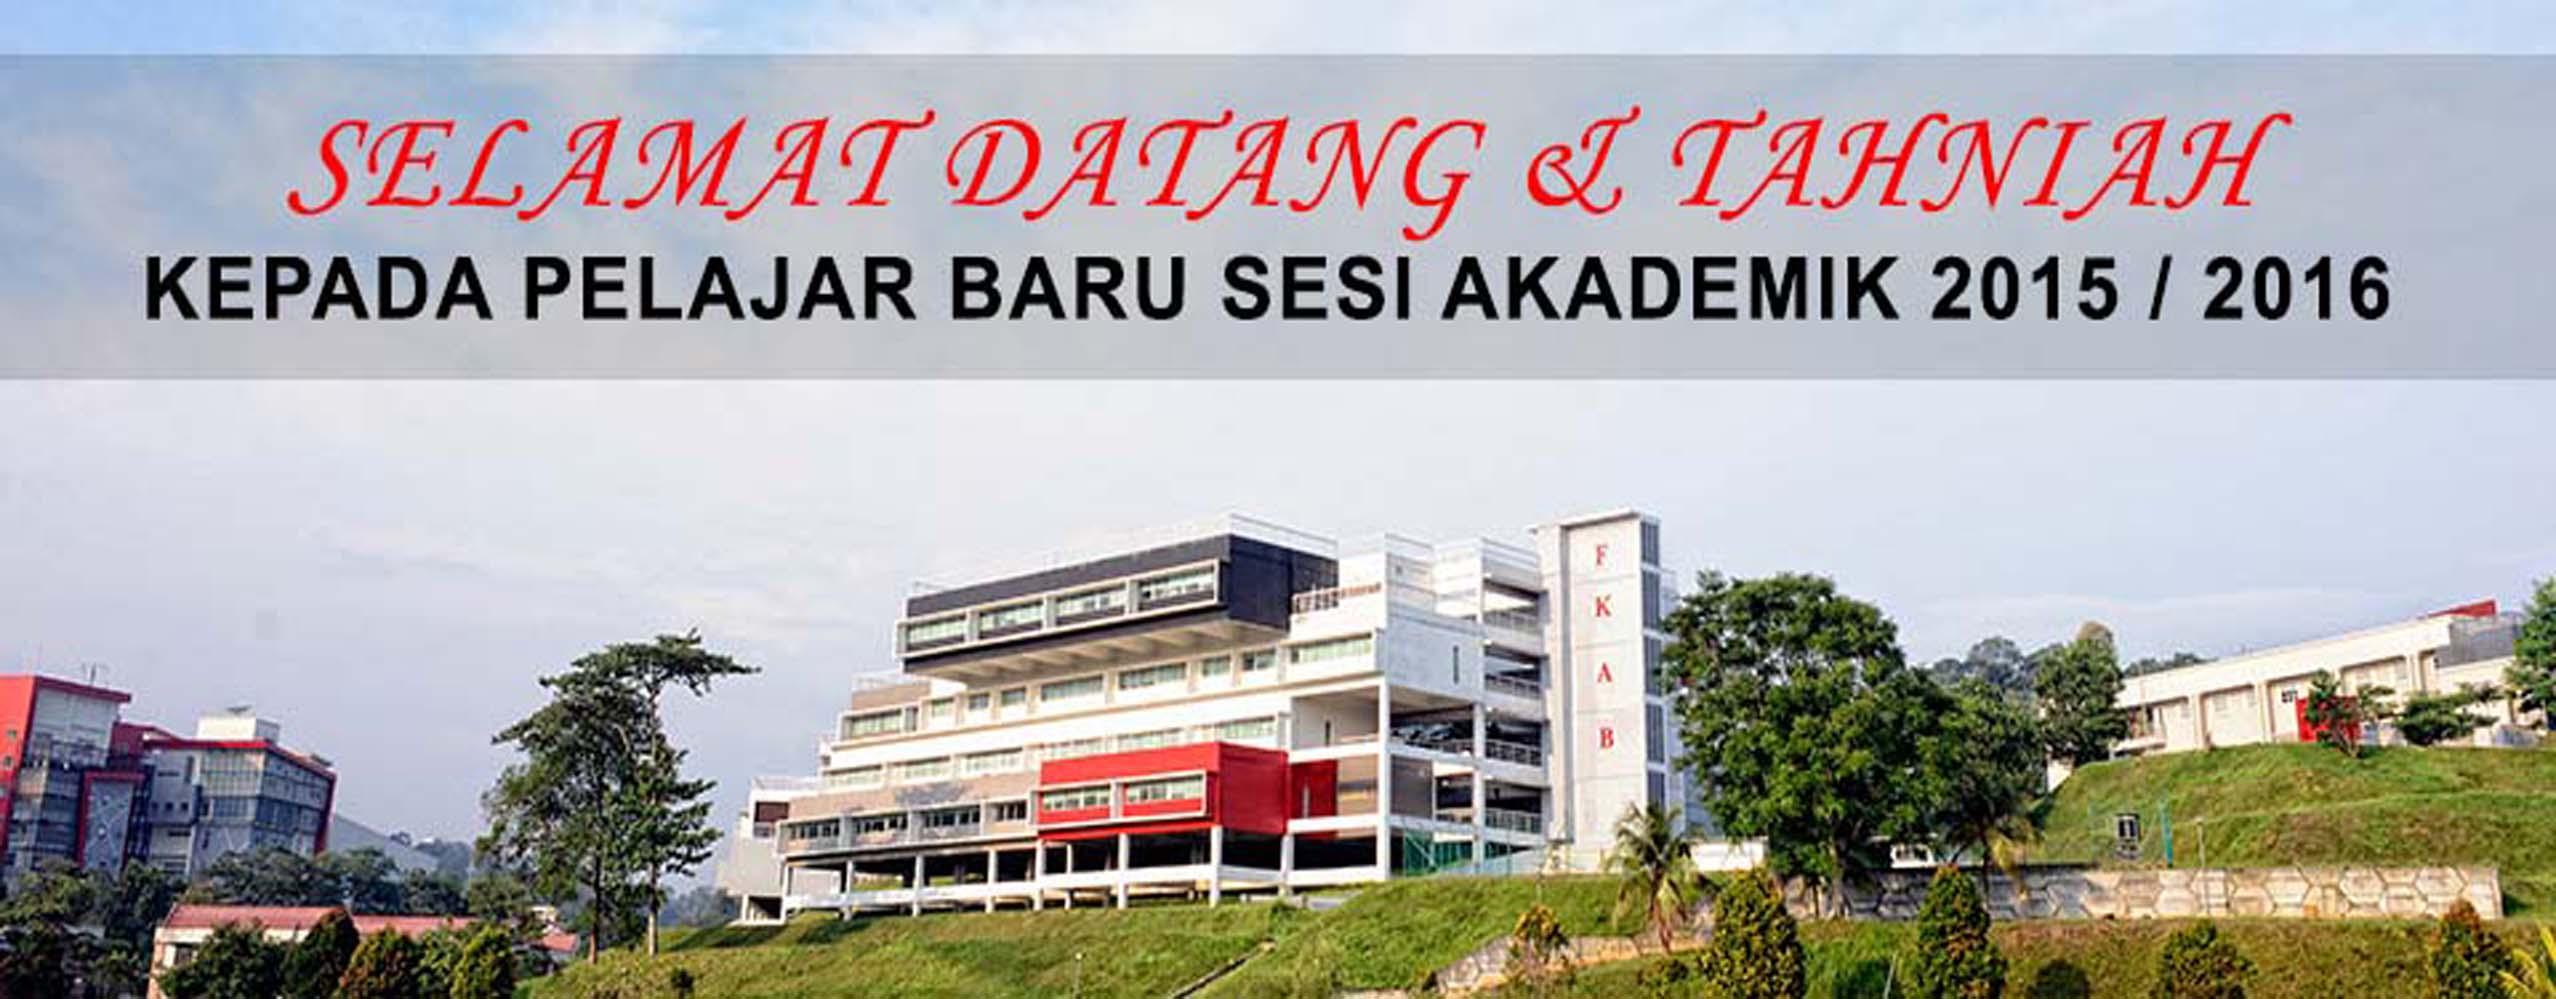 UKM_Engineering_Selamat-Datang-Pelajar-Baru_High_Res